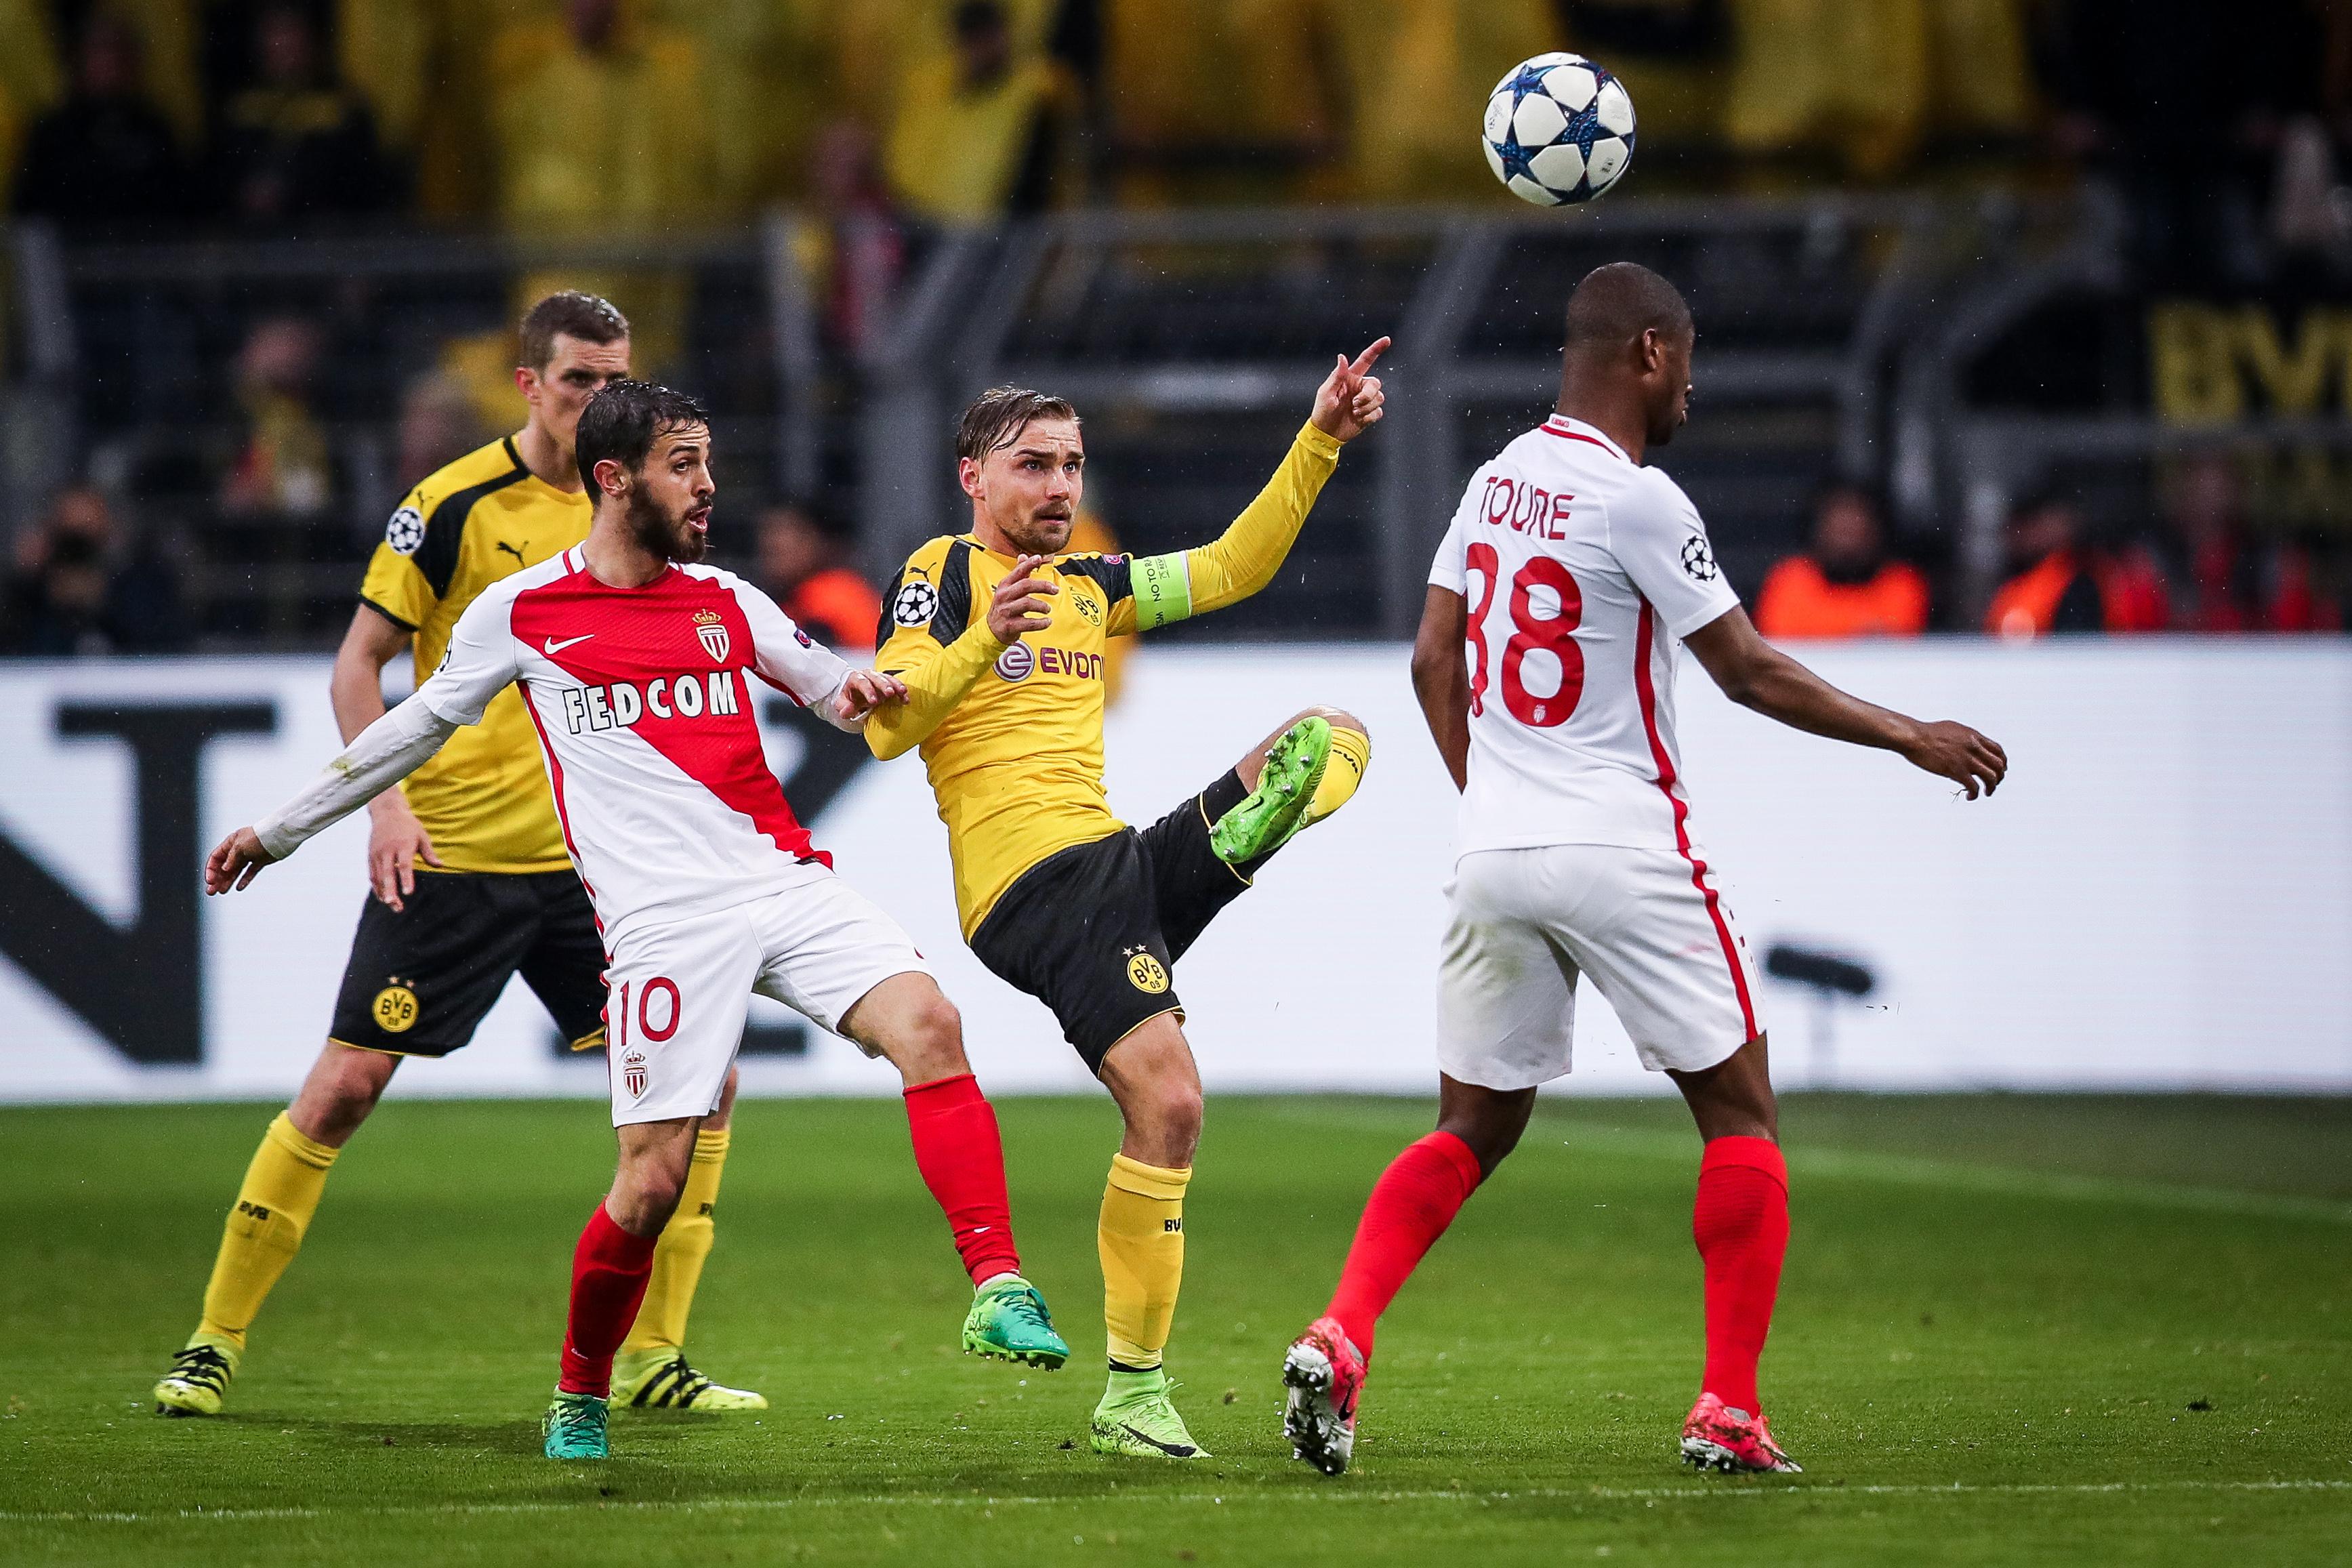 монако ставки на футбол матч тв